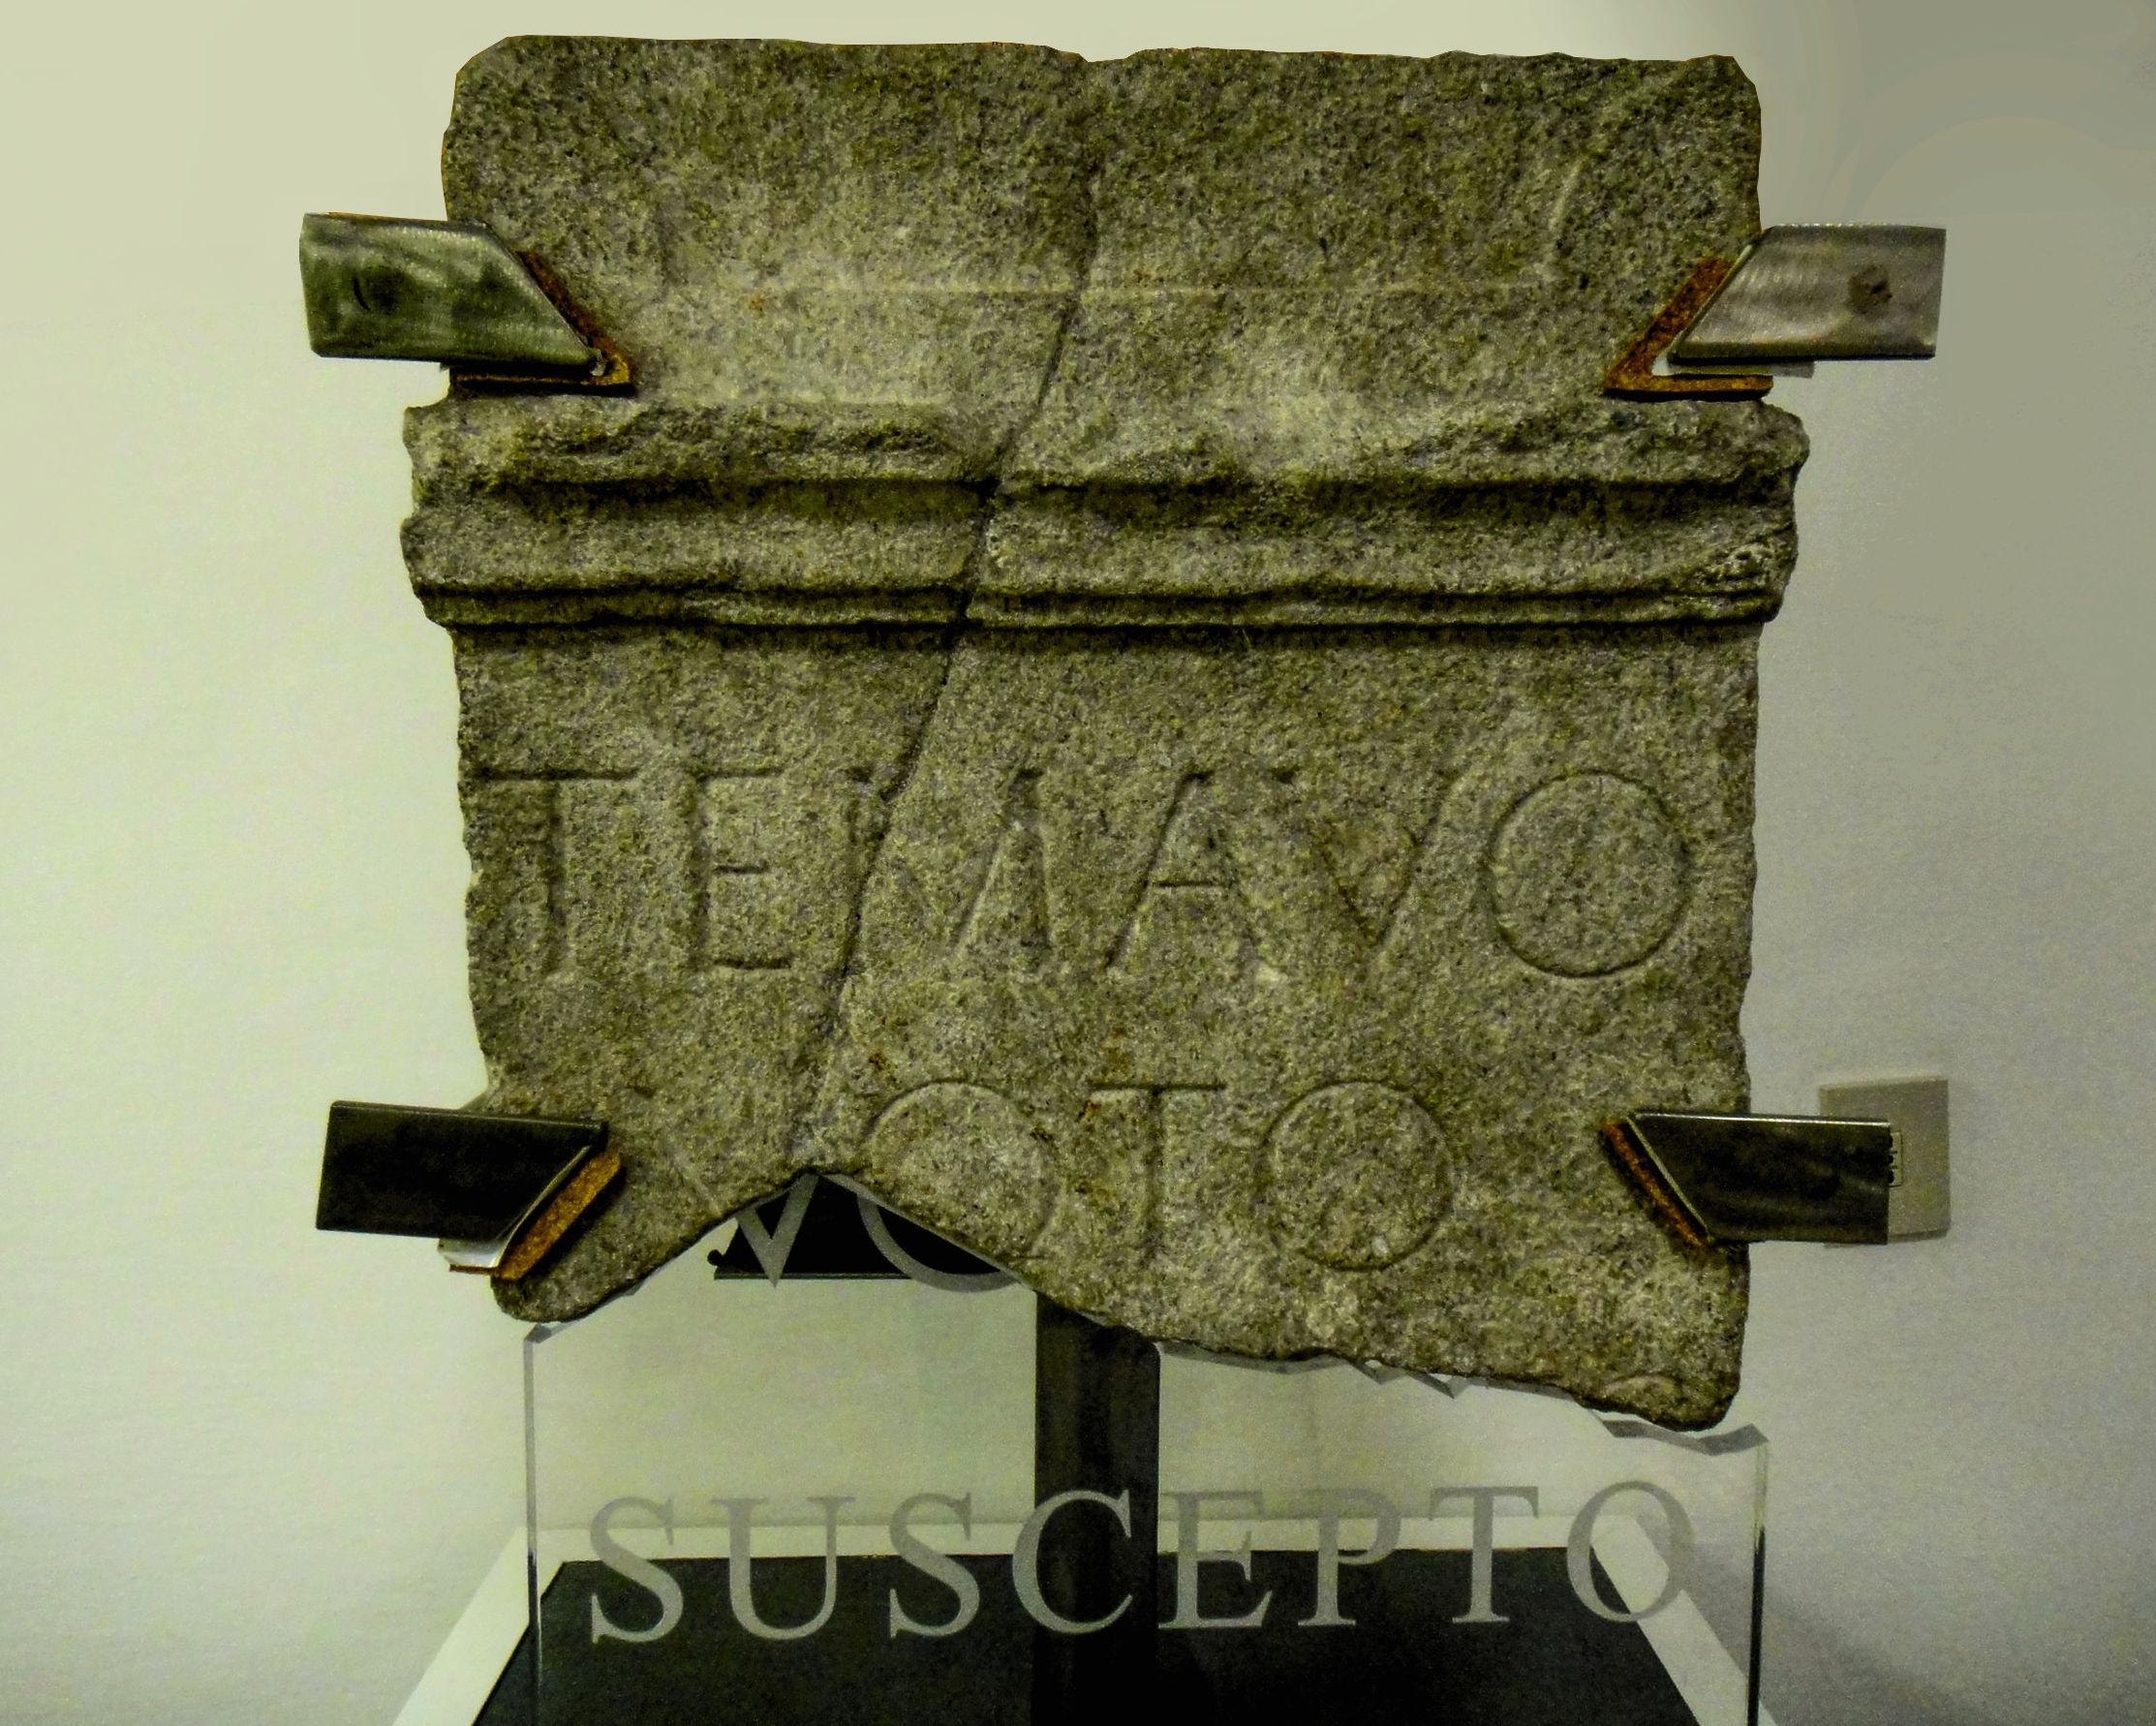 Temavo /voto/[suscept]o/…